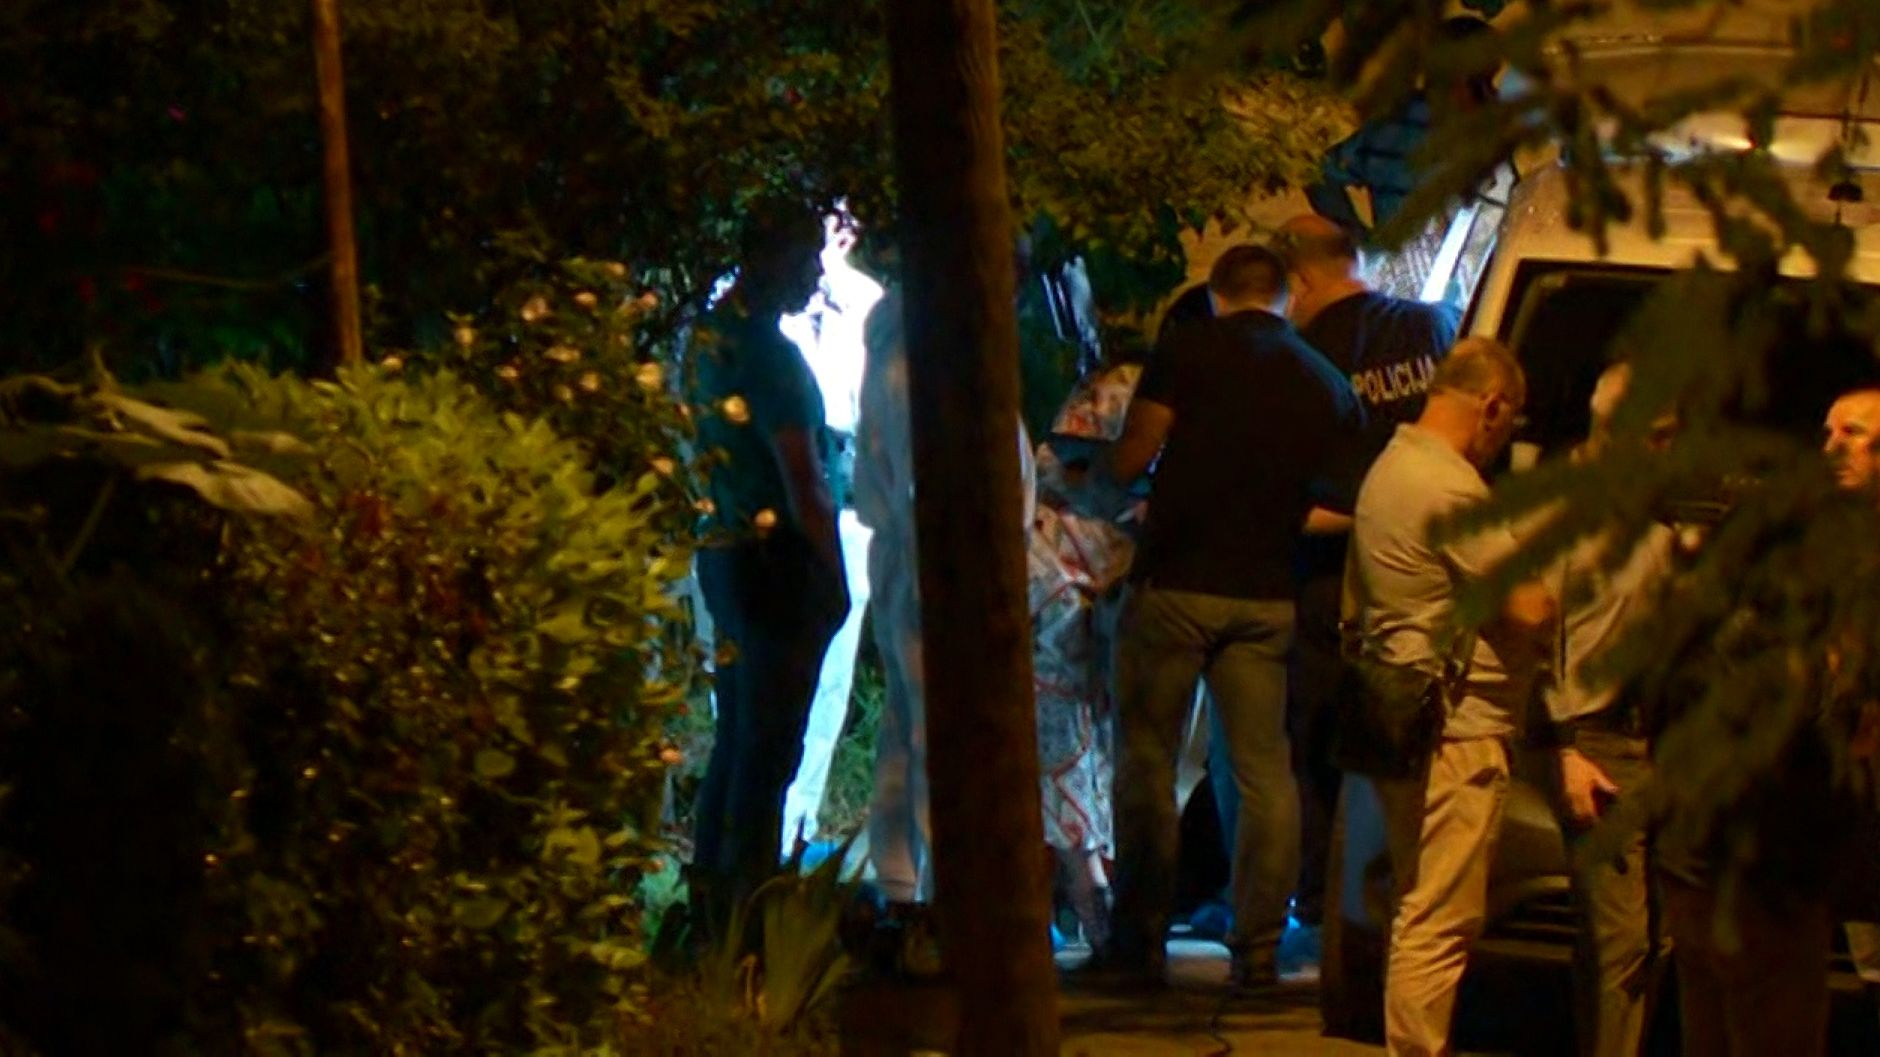 Blutbad in Zagreb: Mann erschießt sechsköpfige Familie